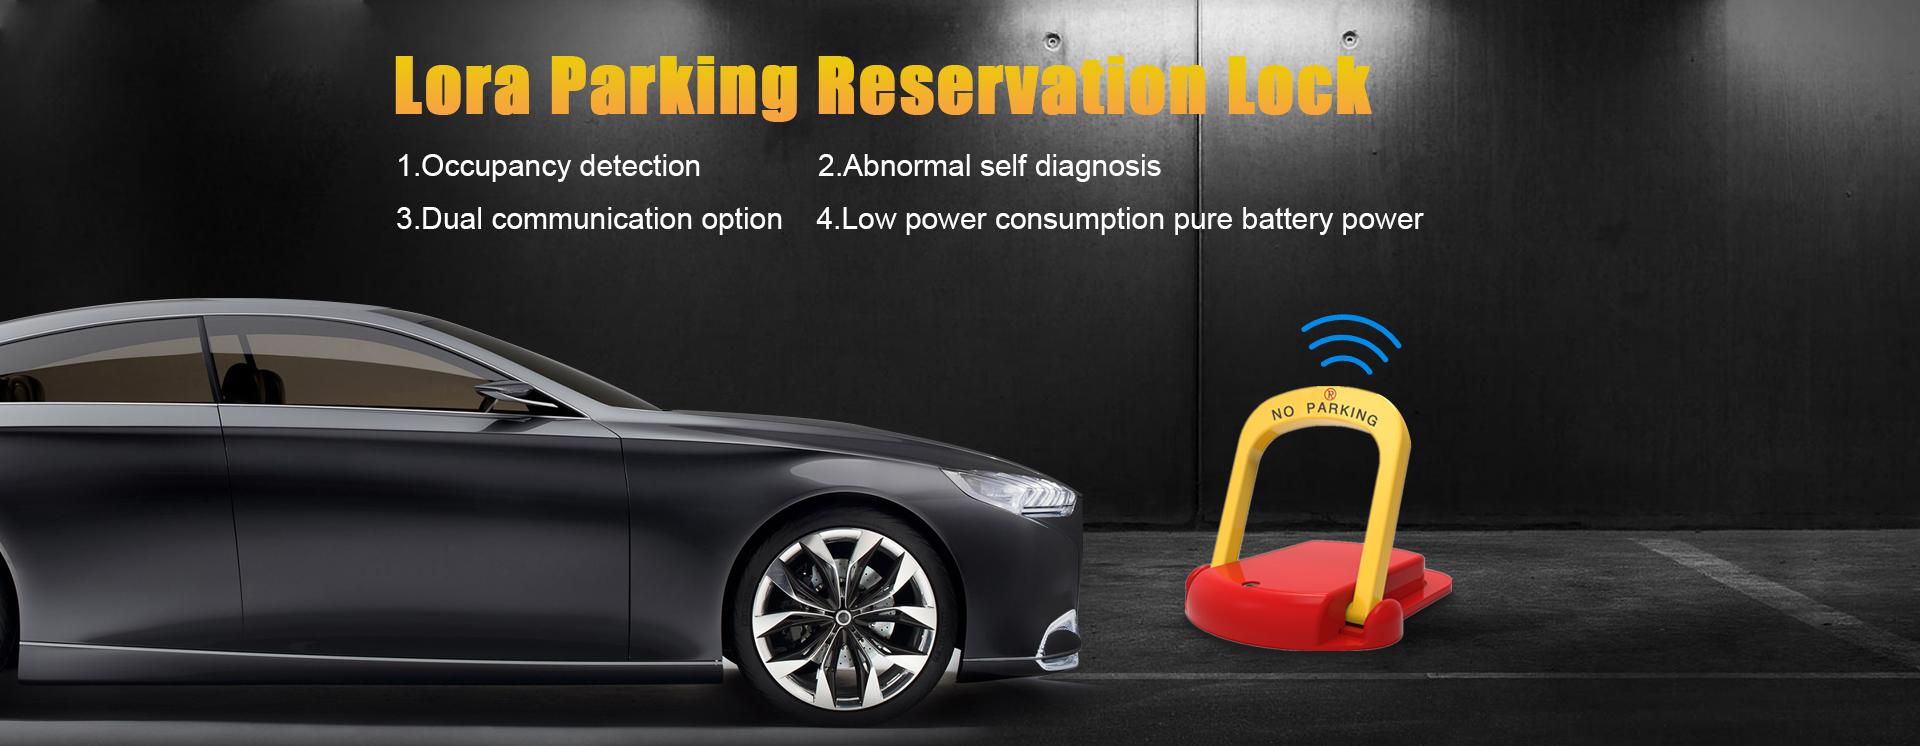 Lora parking resevation lock